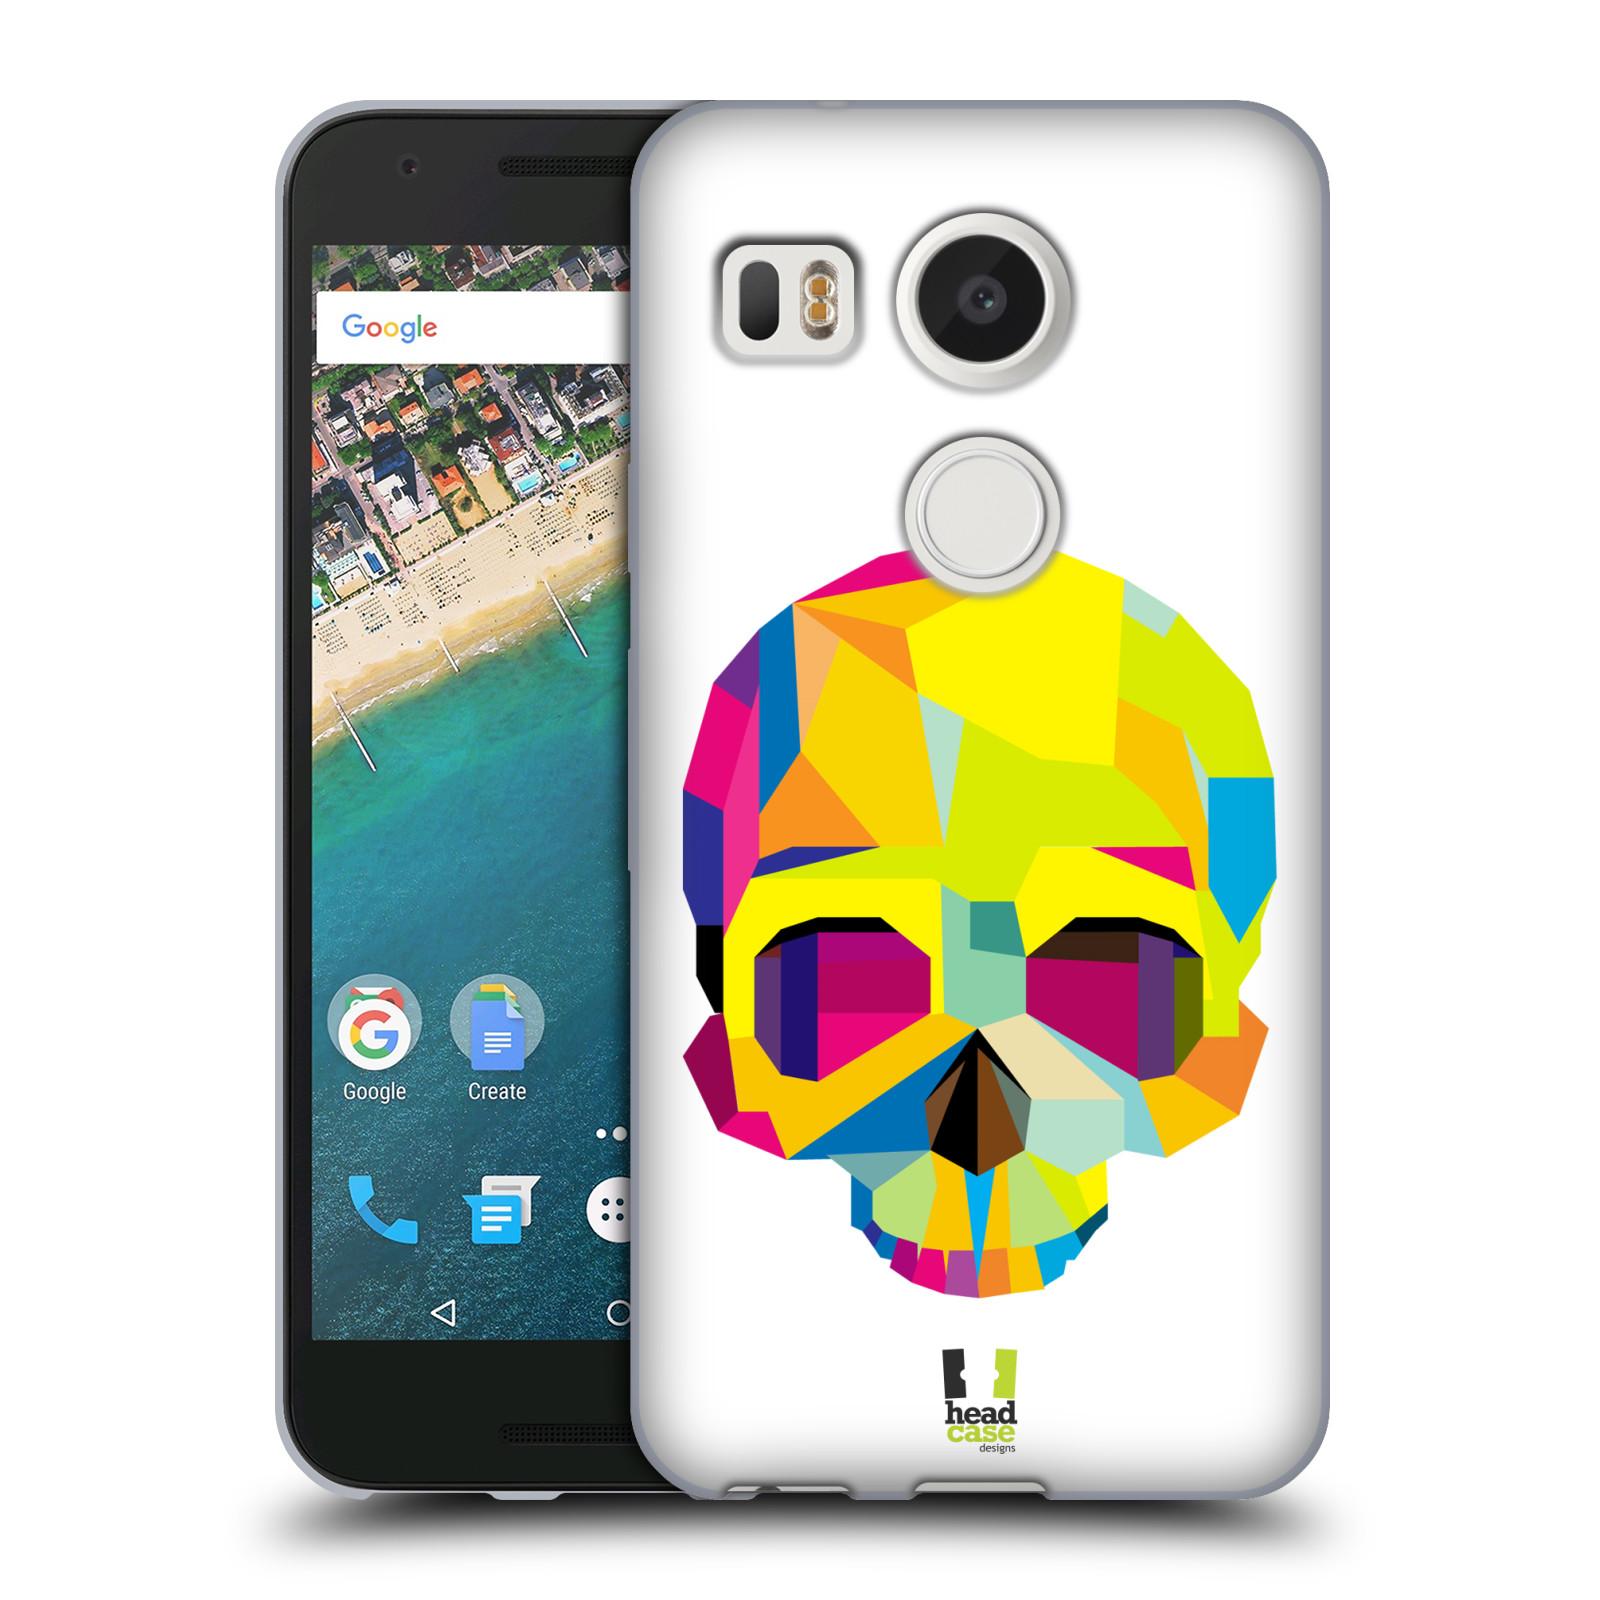 HEAD CASE silikonový obal na mobil LG NEXUS 5X vzor POP ART kubismus smrtelnost